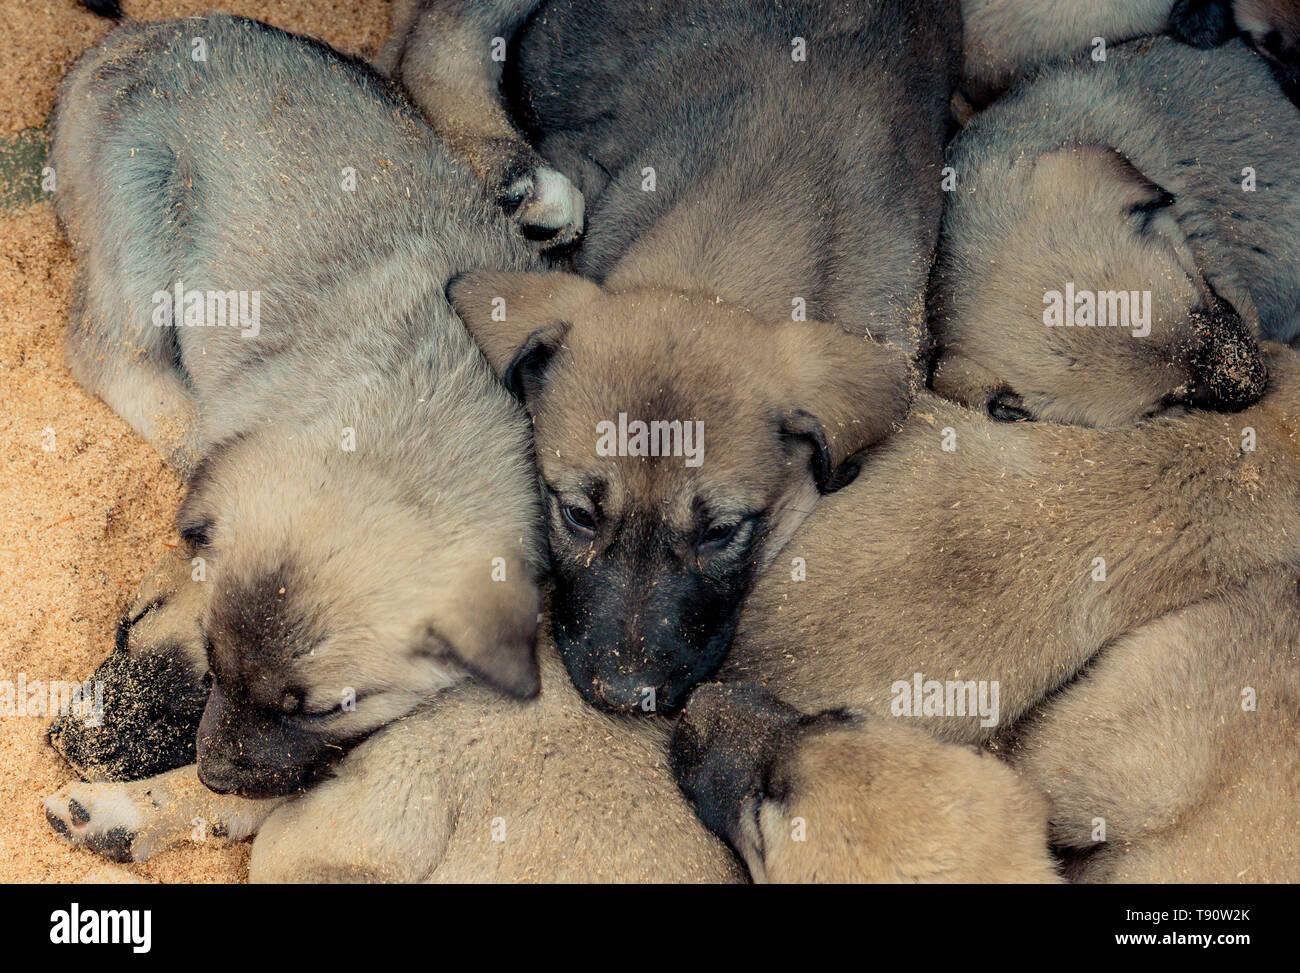 Turkish Kangal Dog Stock Photos & Turkish Kangal Dog Stock